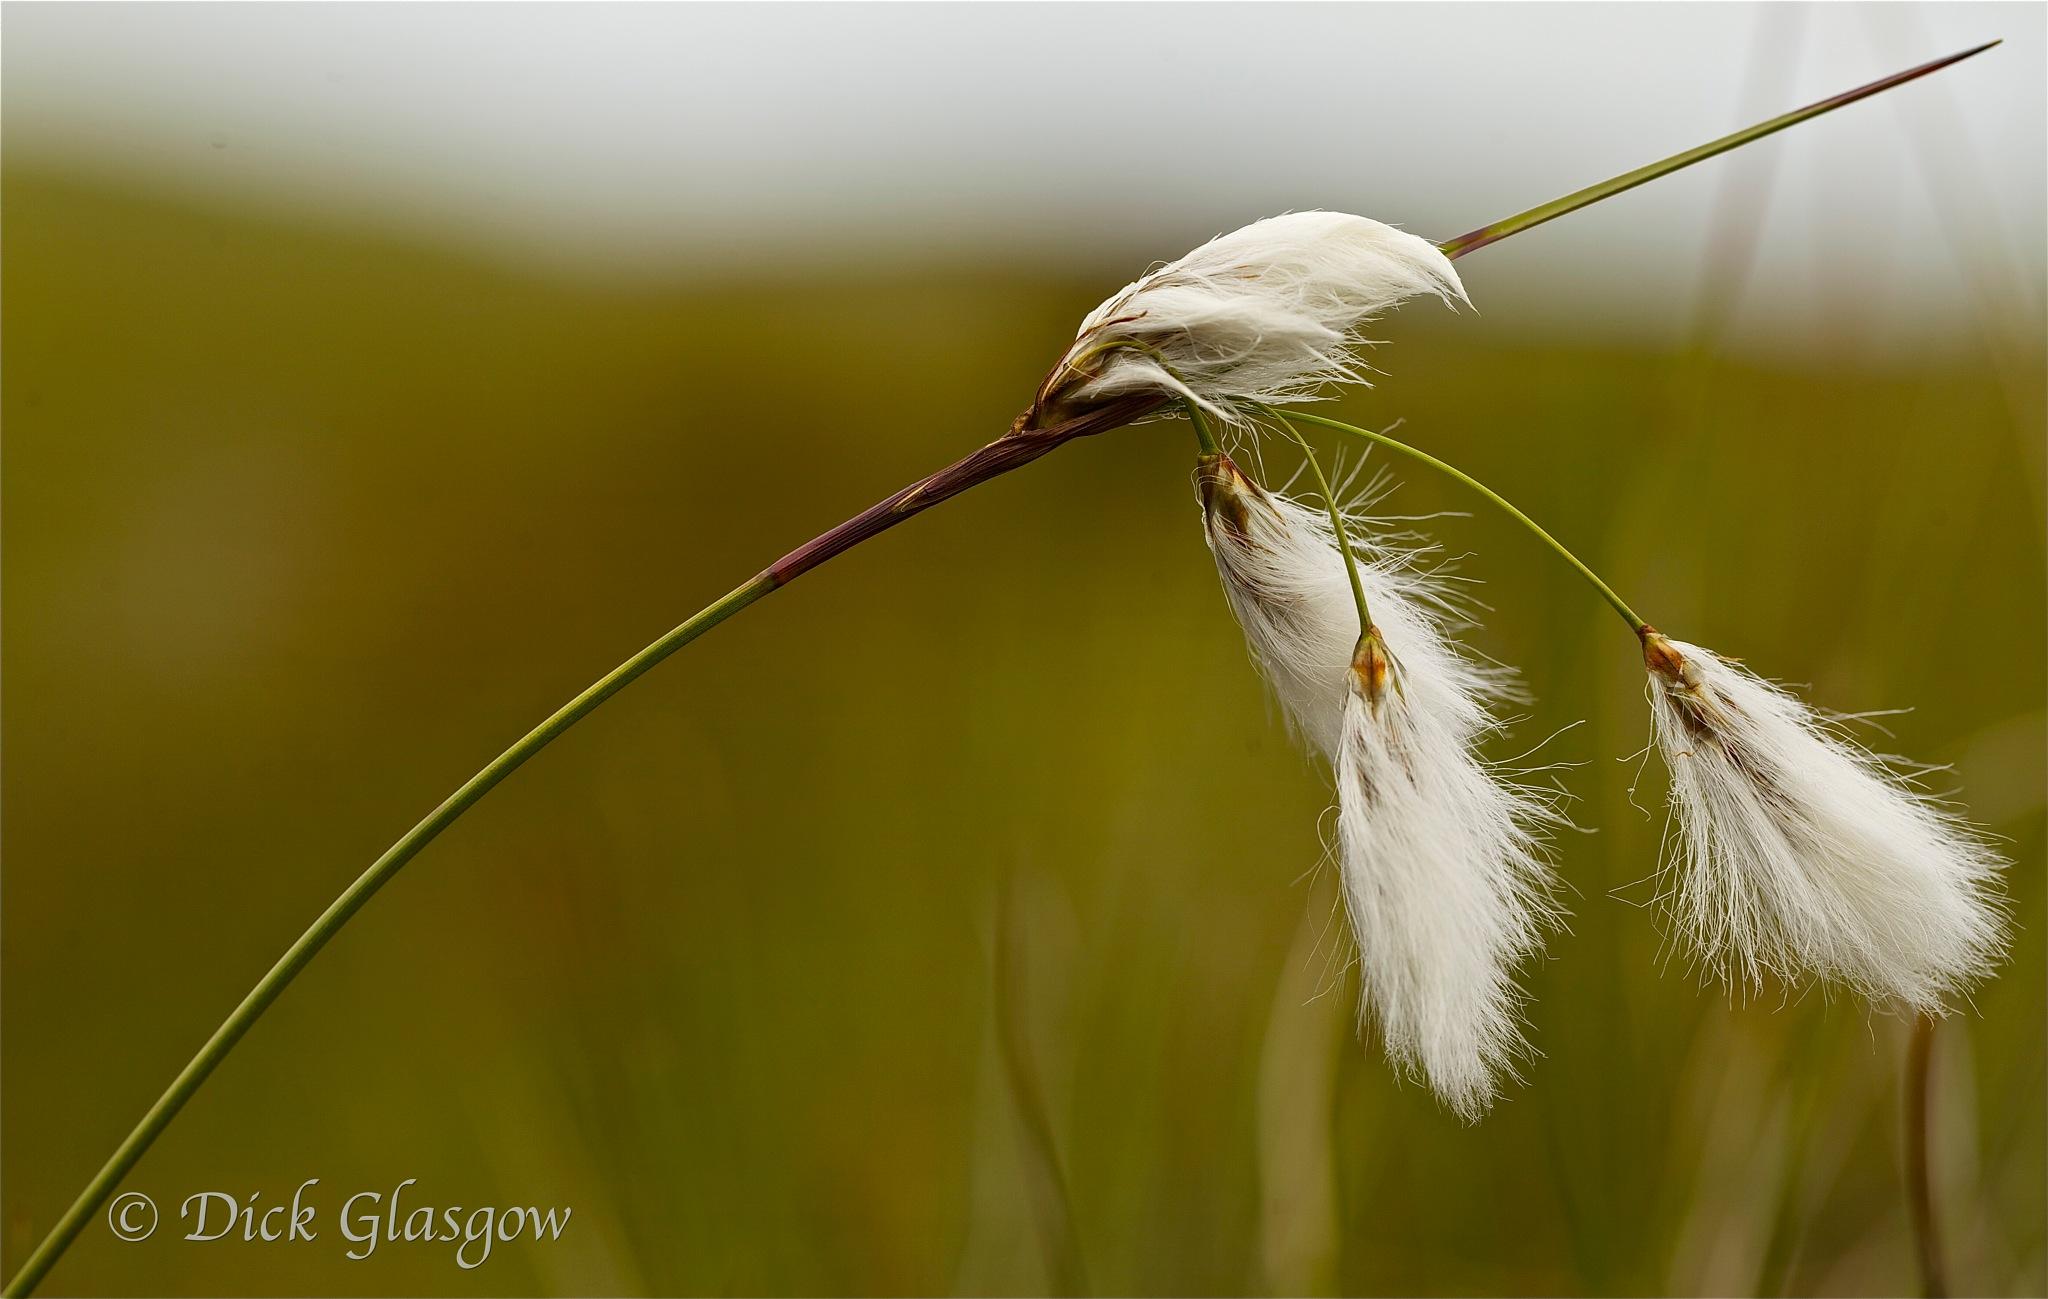 Bog Cotton by Dick Glasgow